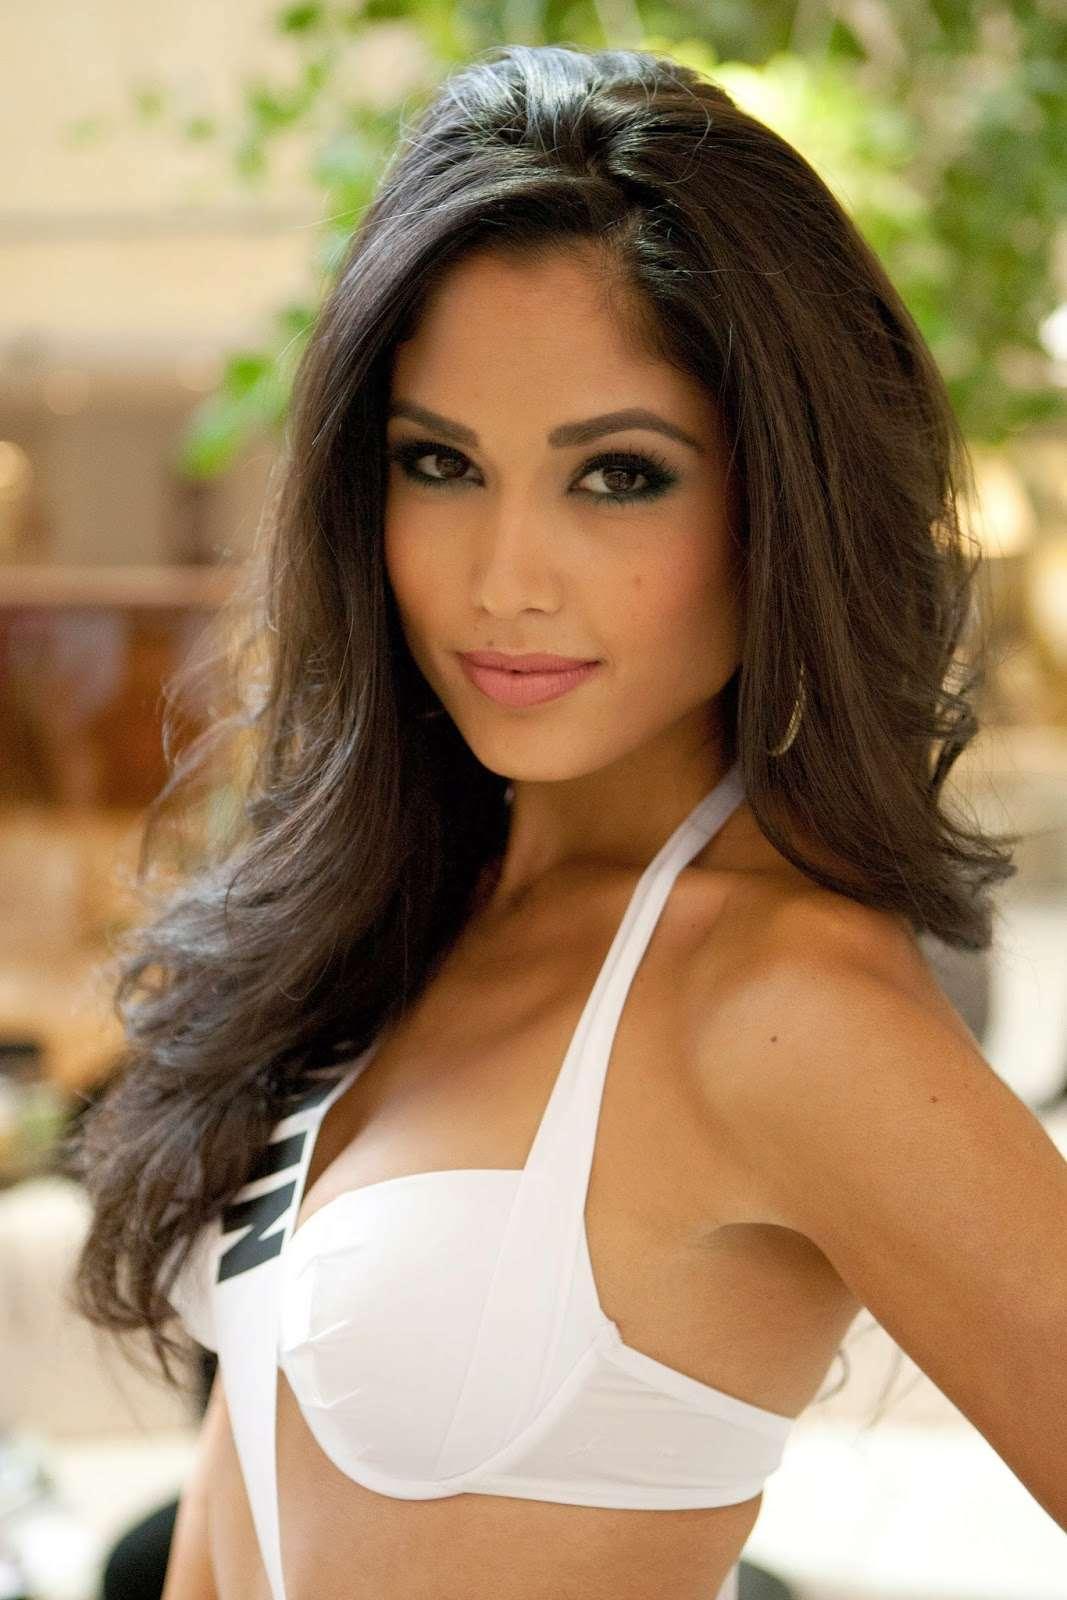 patricia yurena rodriguez, miss espana 2008/2013, 1st runner-up de miss universe 2013. - Página 5 Uni20114